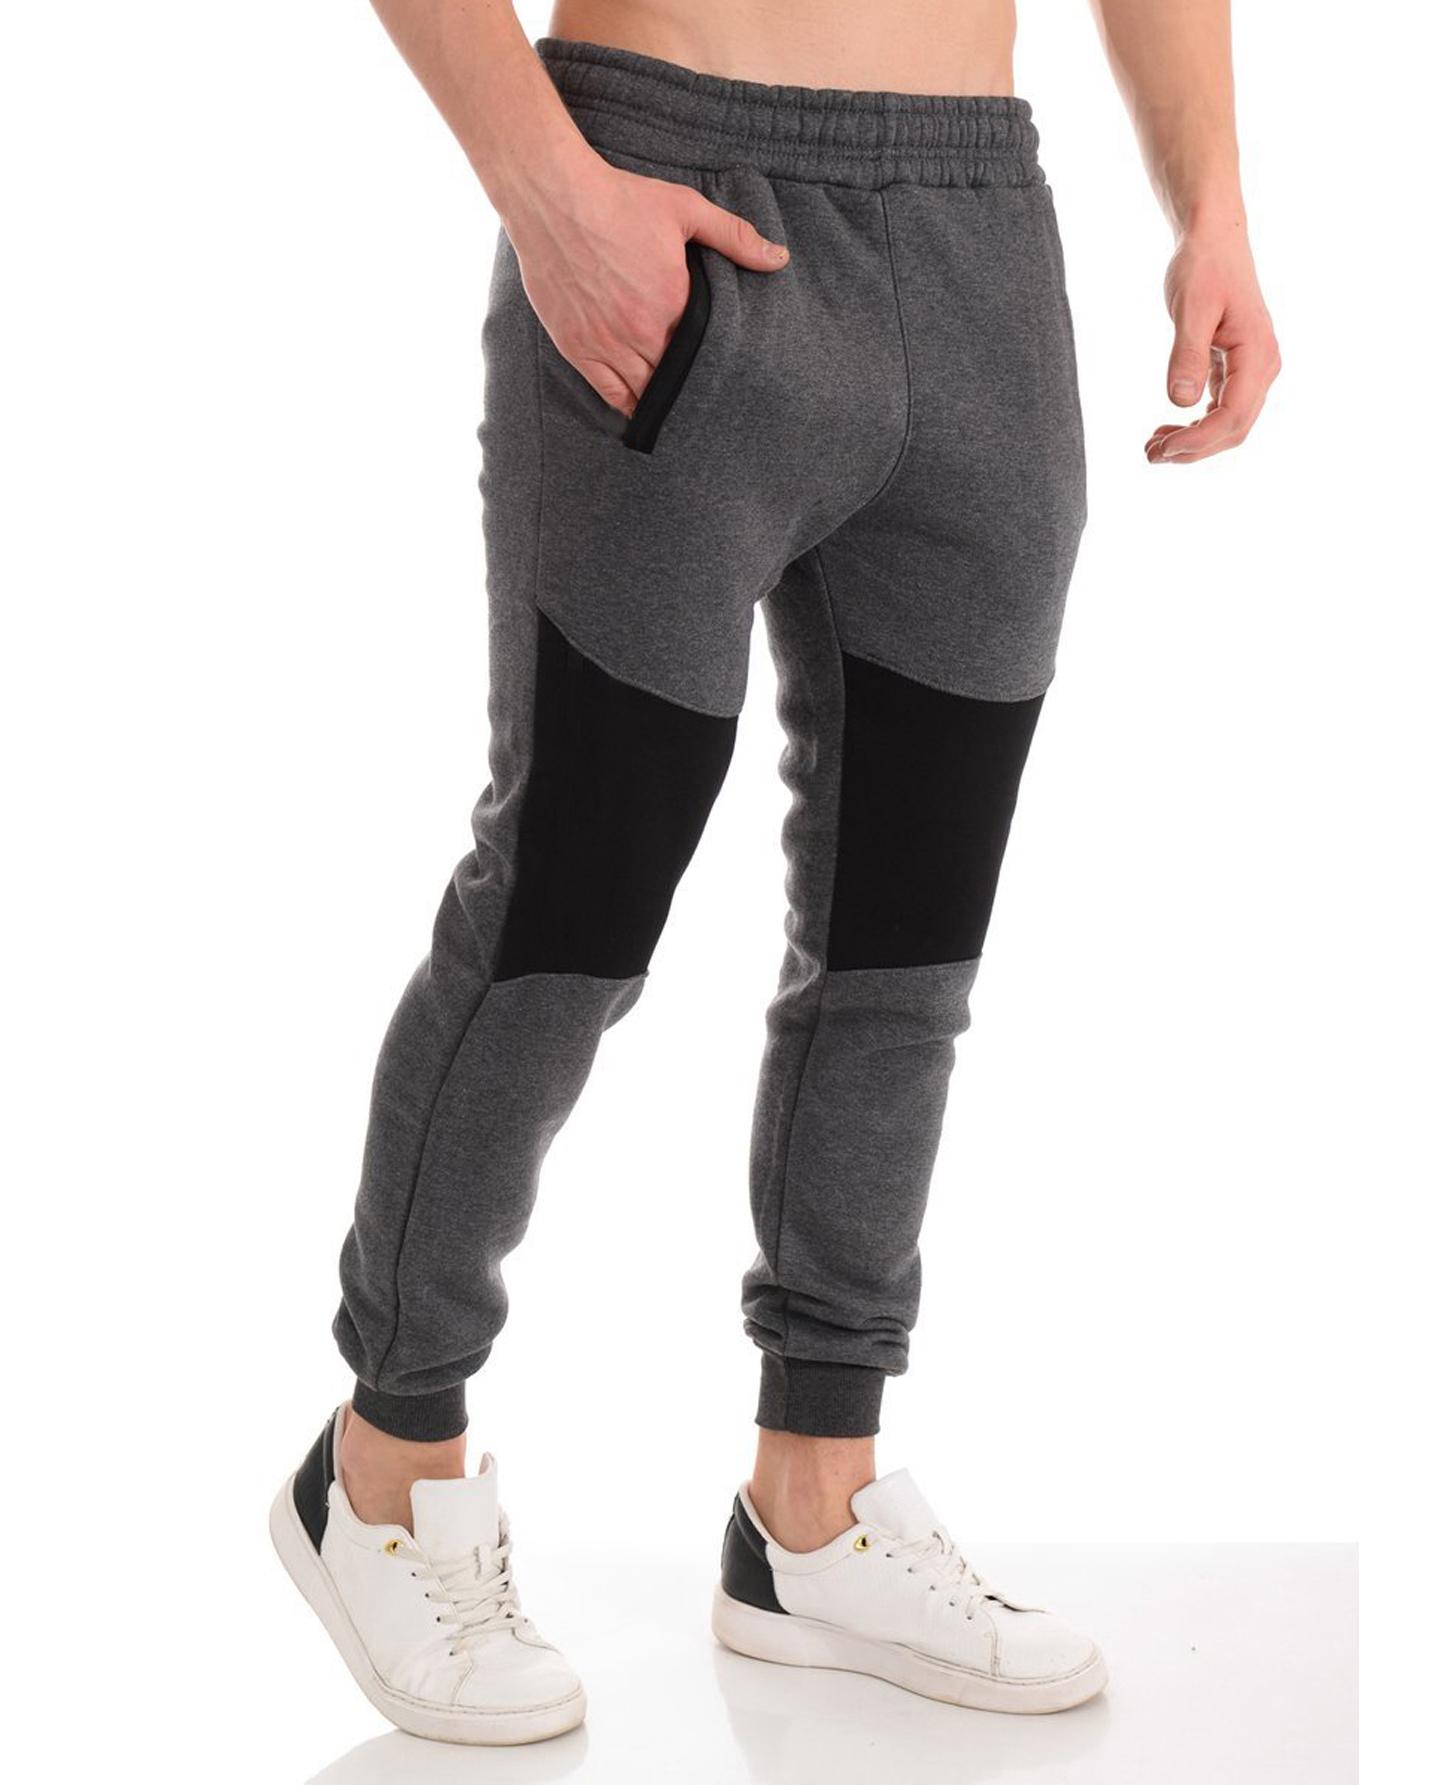 Men's Casual Zipper Stitching Trousers Autumn Pants Sports Jogging Pants 2020 New Men's Pants Tight Long Cotton Pants Sports Pants 2